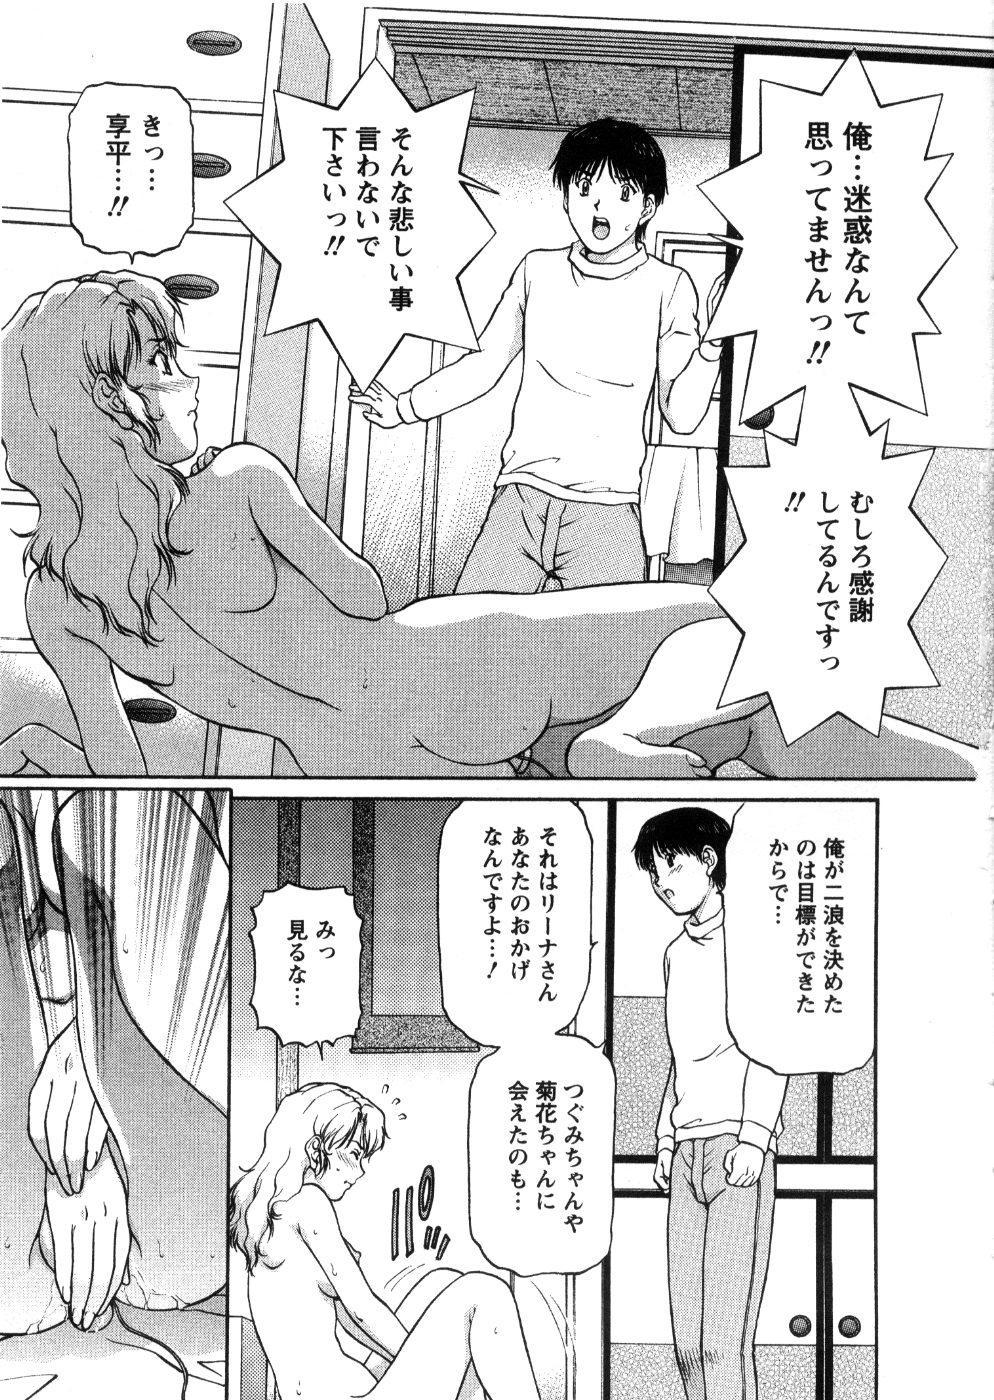 Oneechan-tachi ga Yatte Kuru 03 102